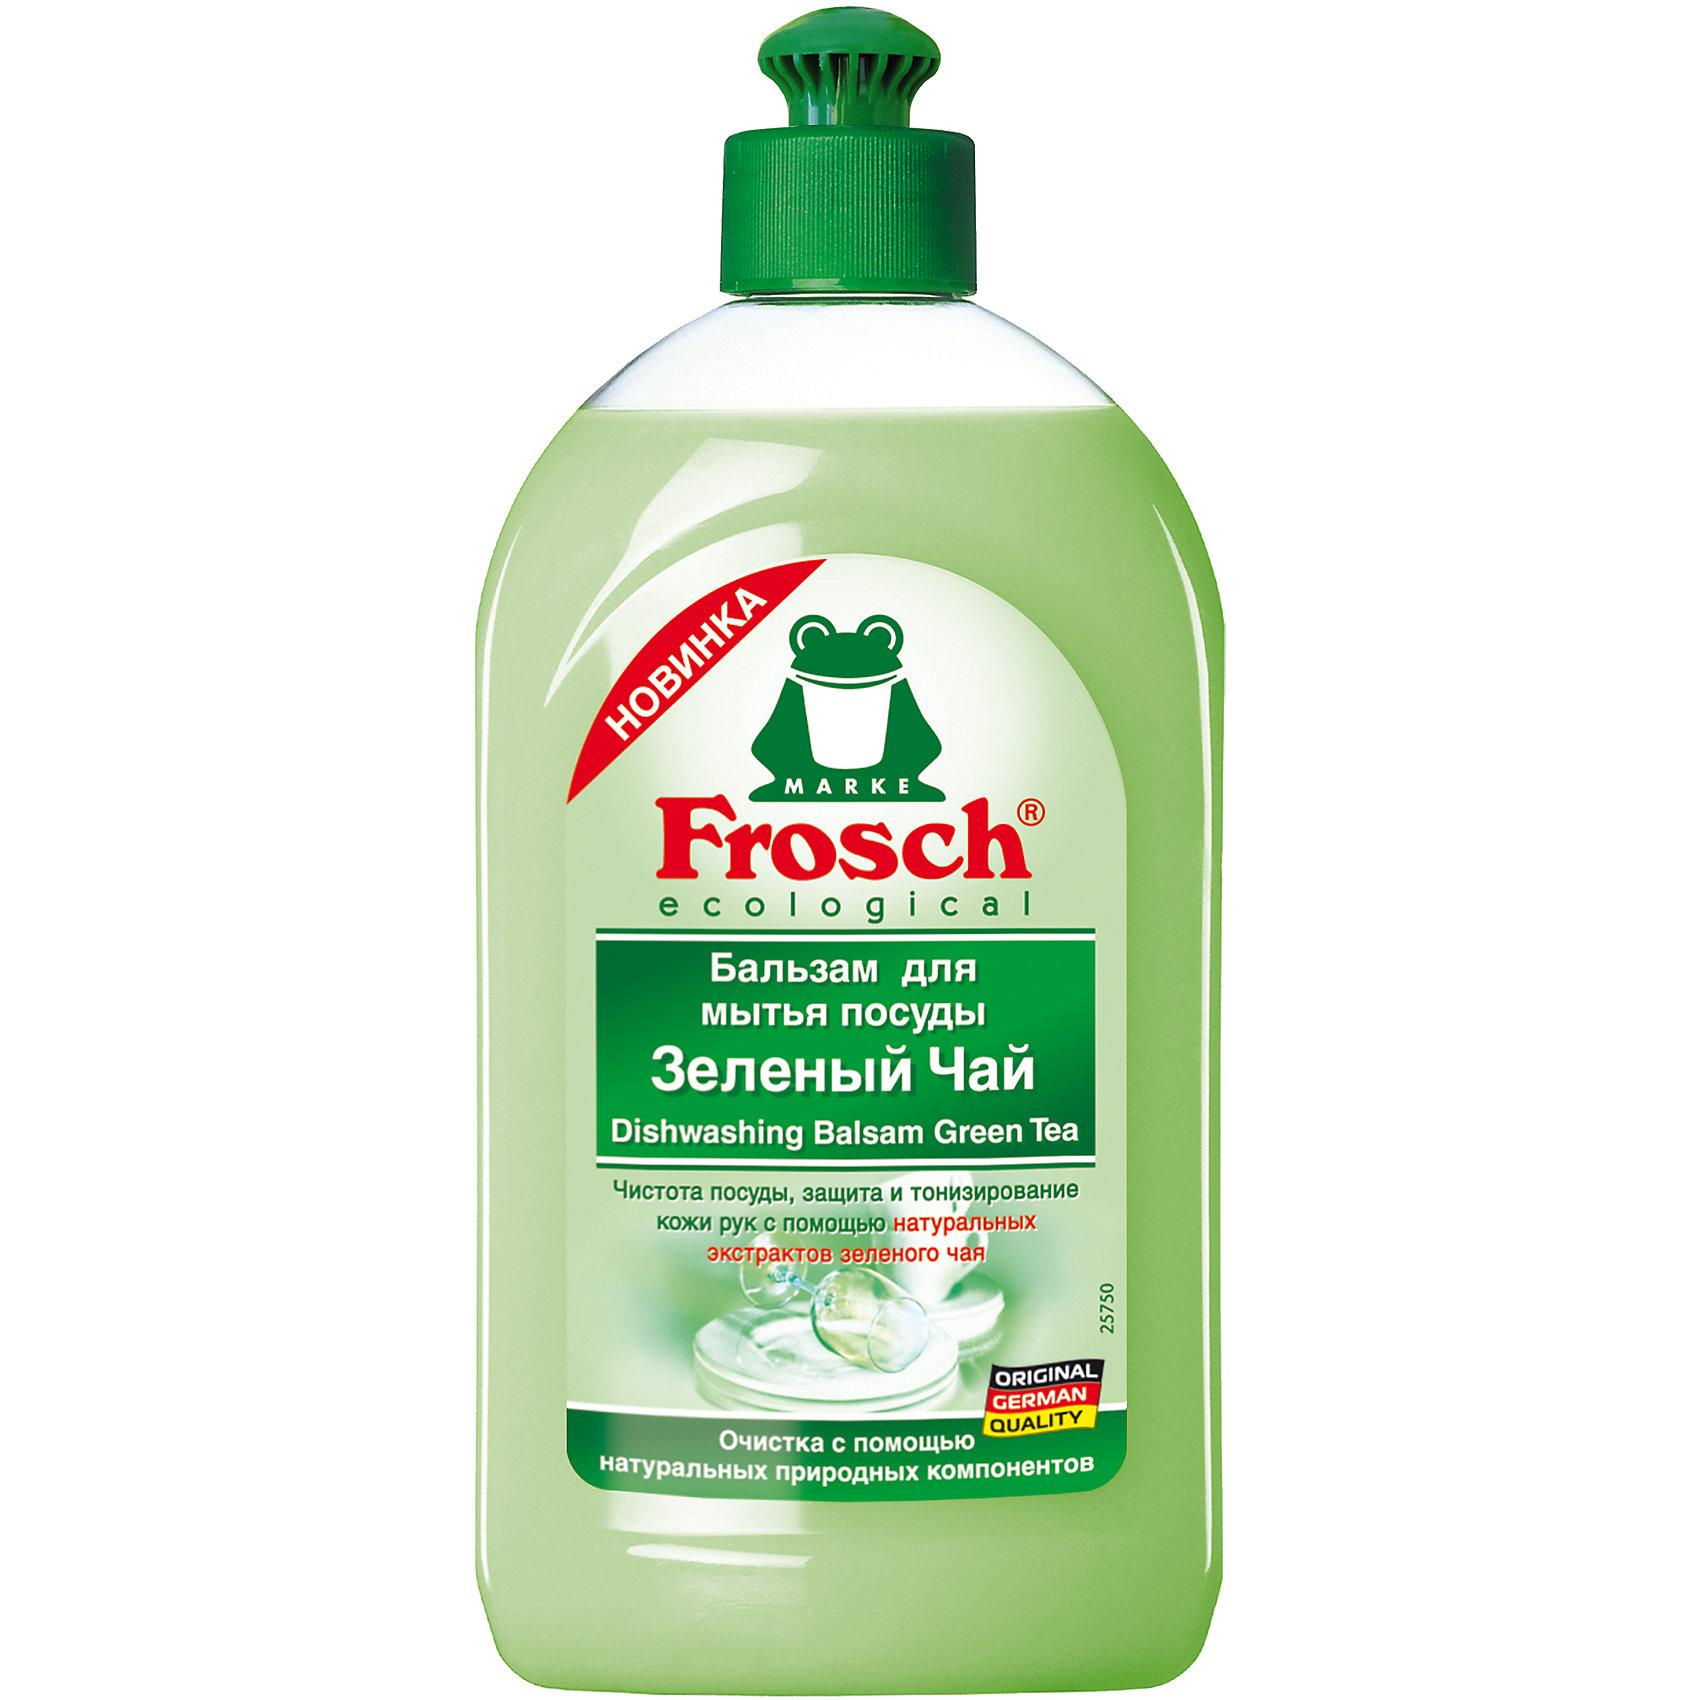 - Бальзам для мытья посуды (зеленый чай), 0,5 л., Frosch средство аоs для мытья посуды бальзам